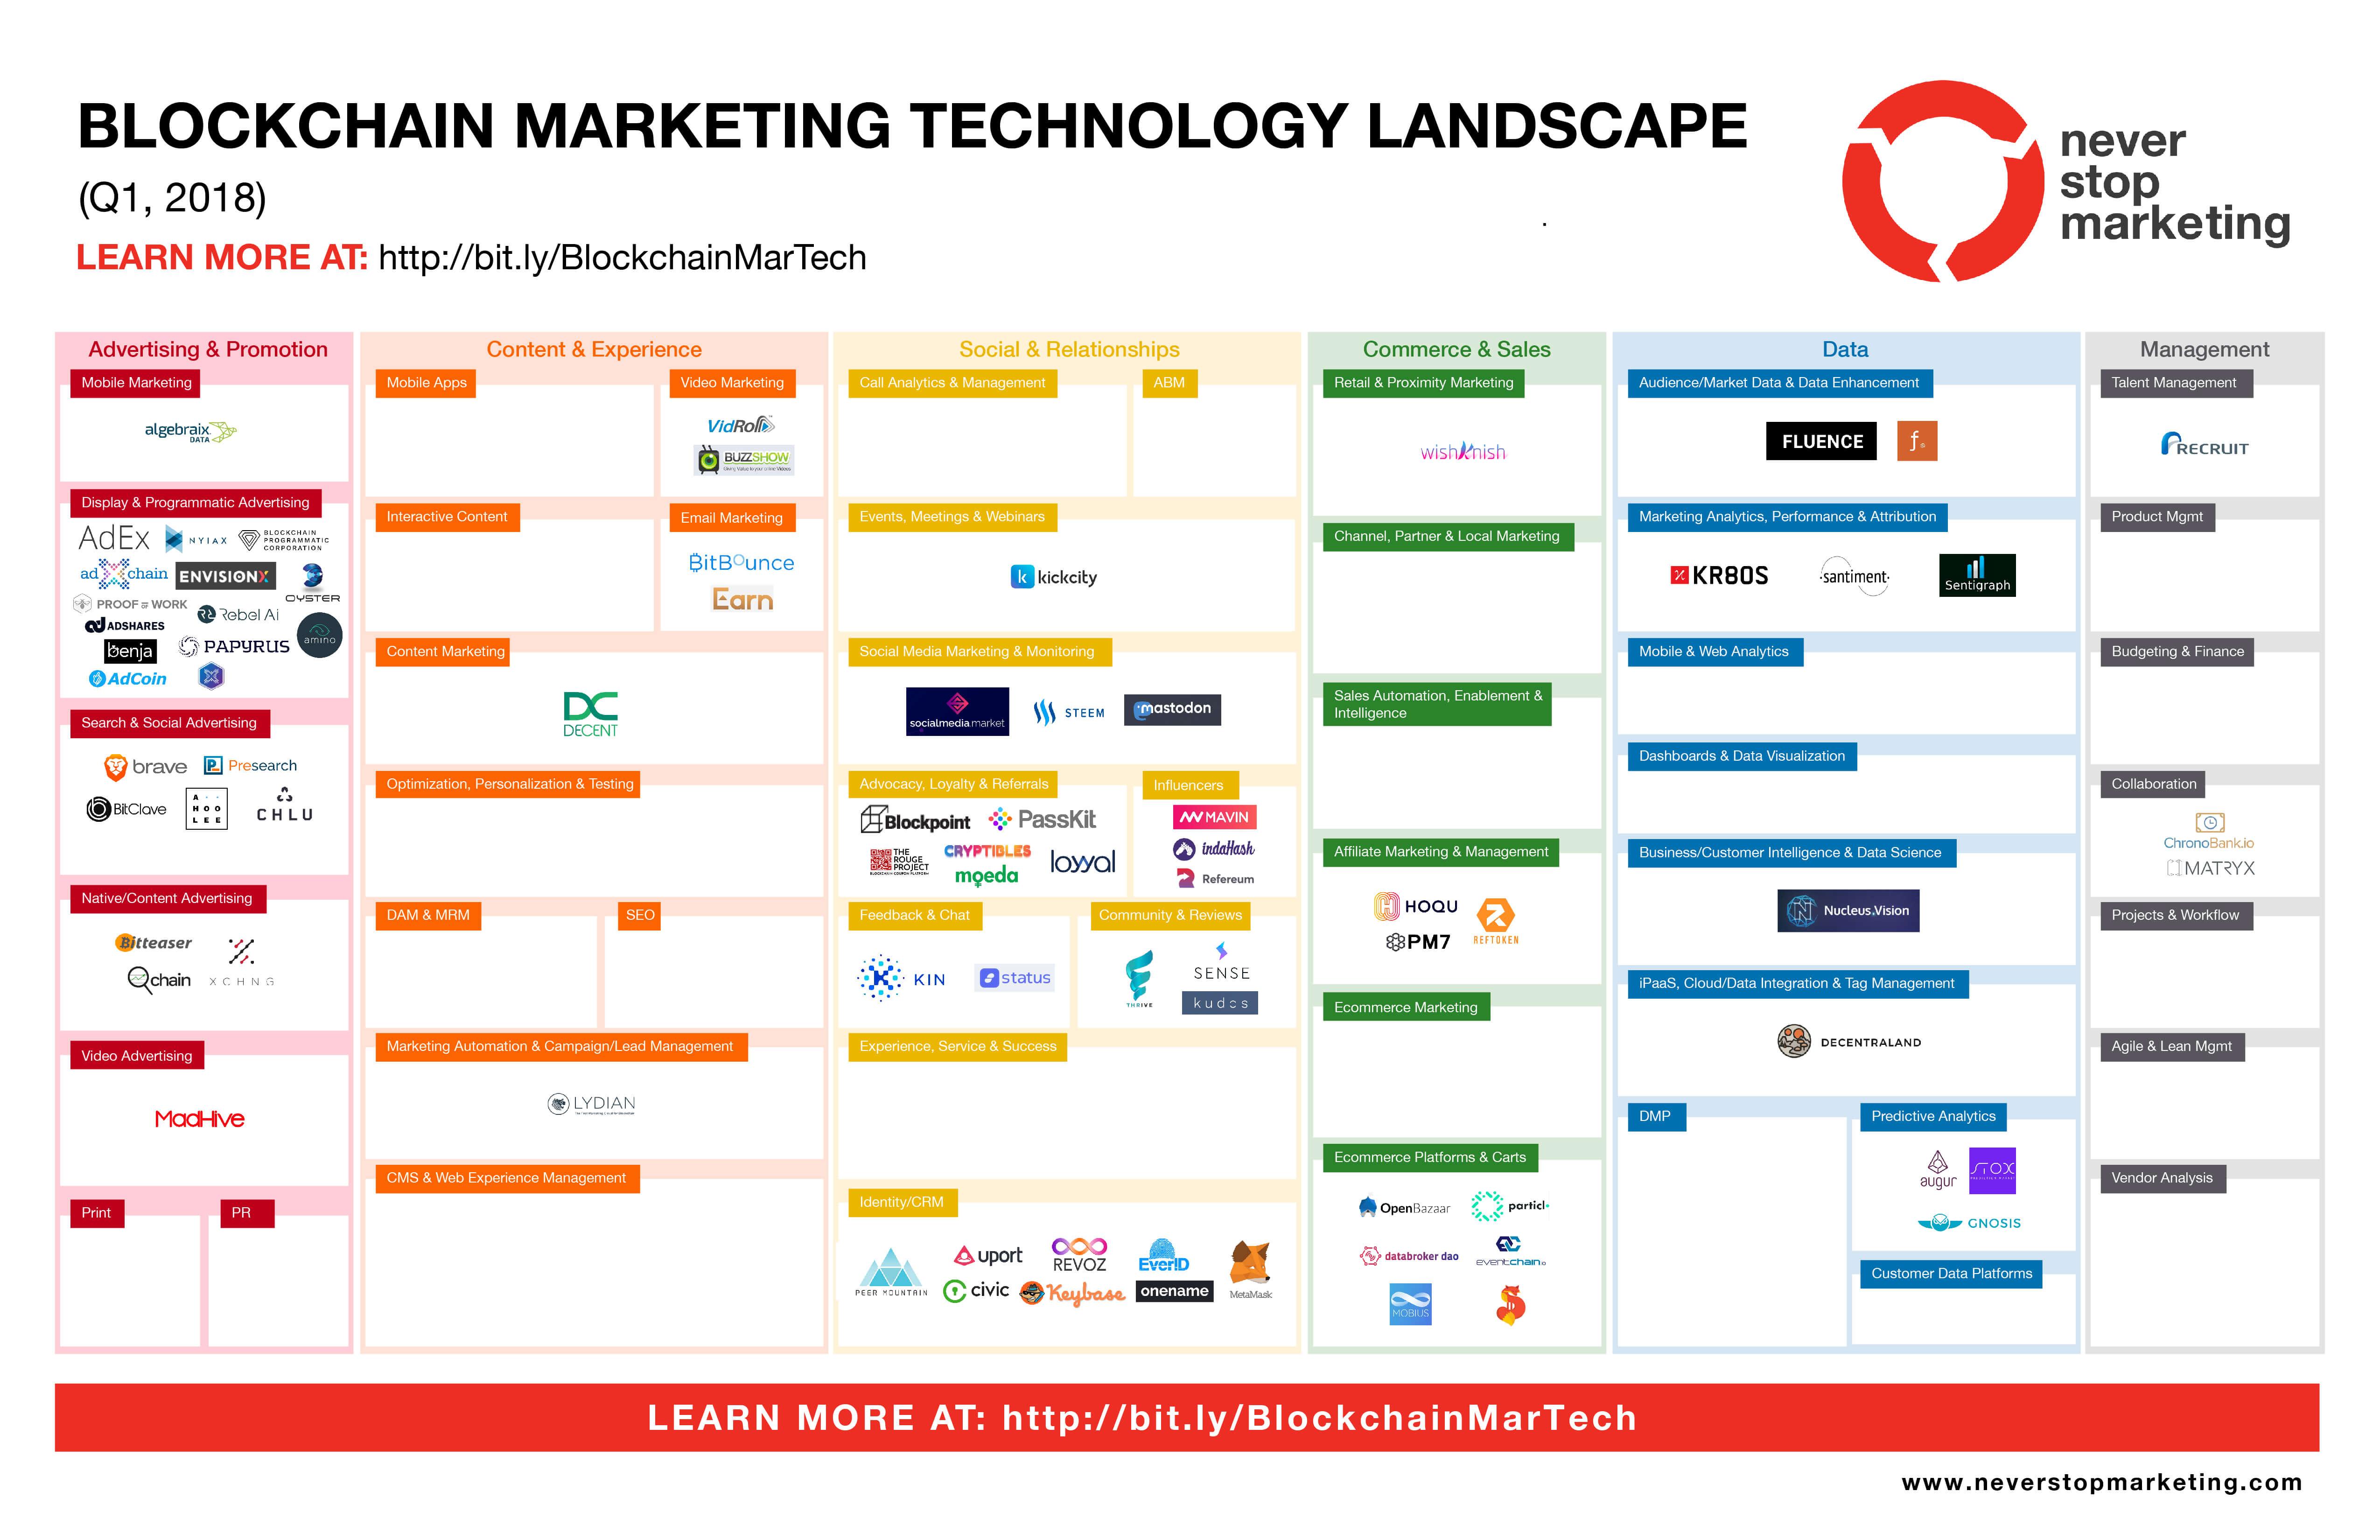 blockchain marketing martech landscape